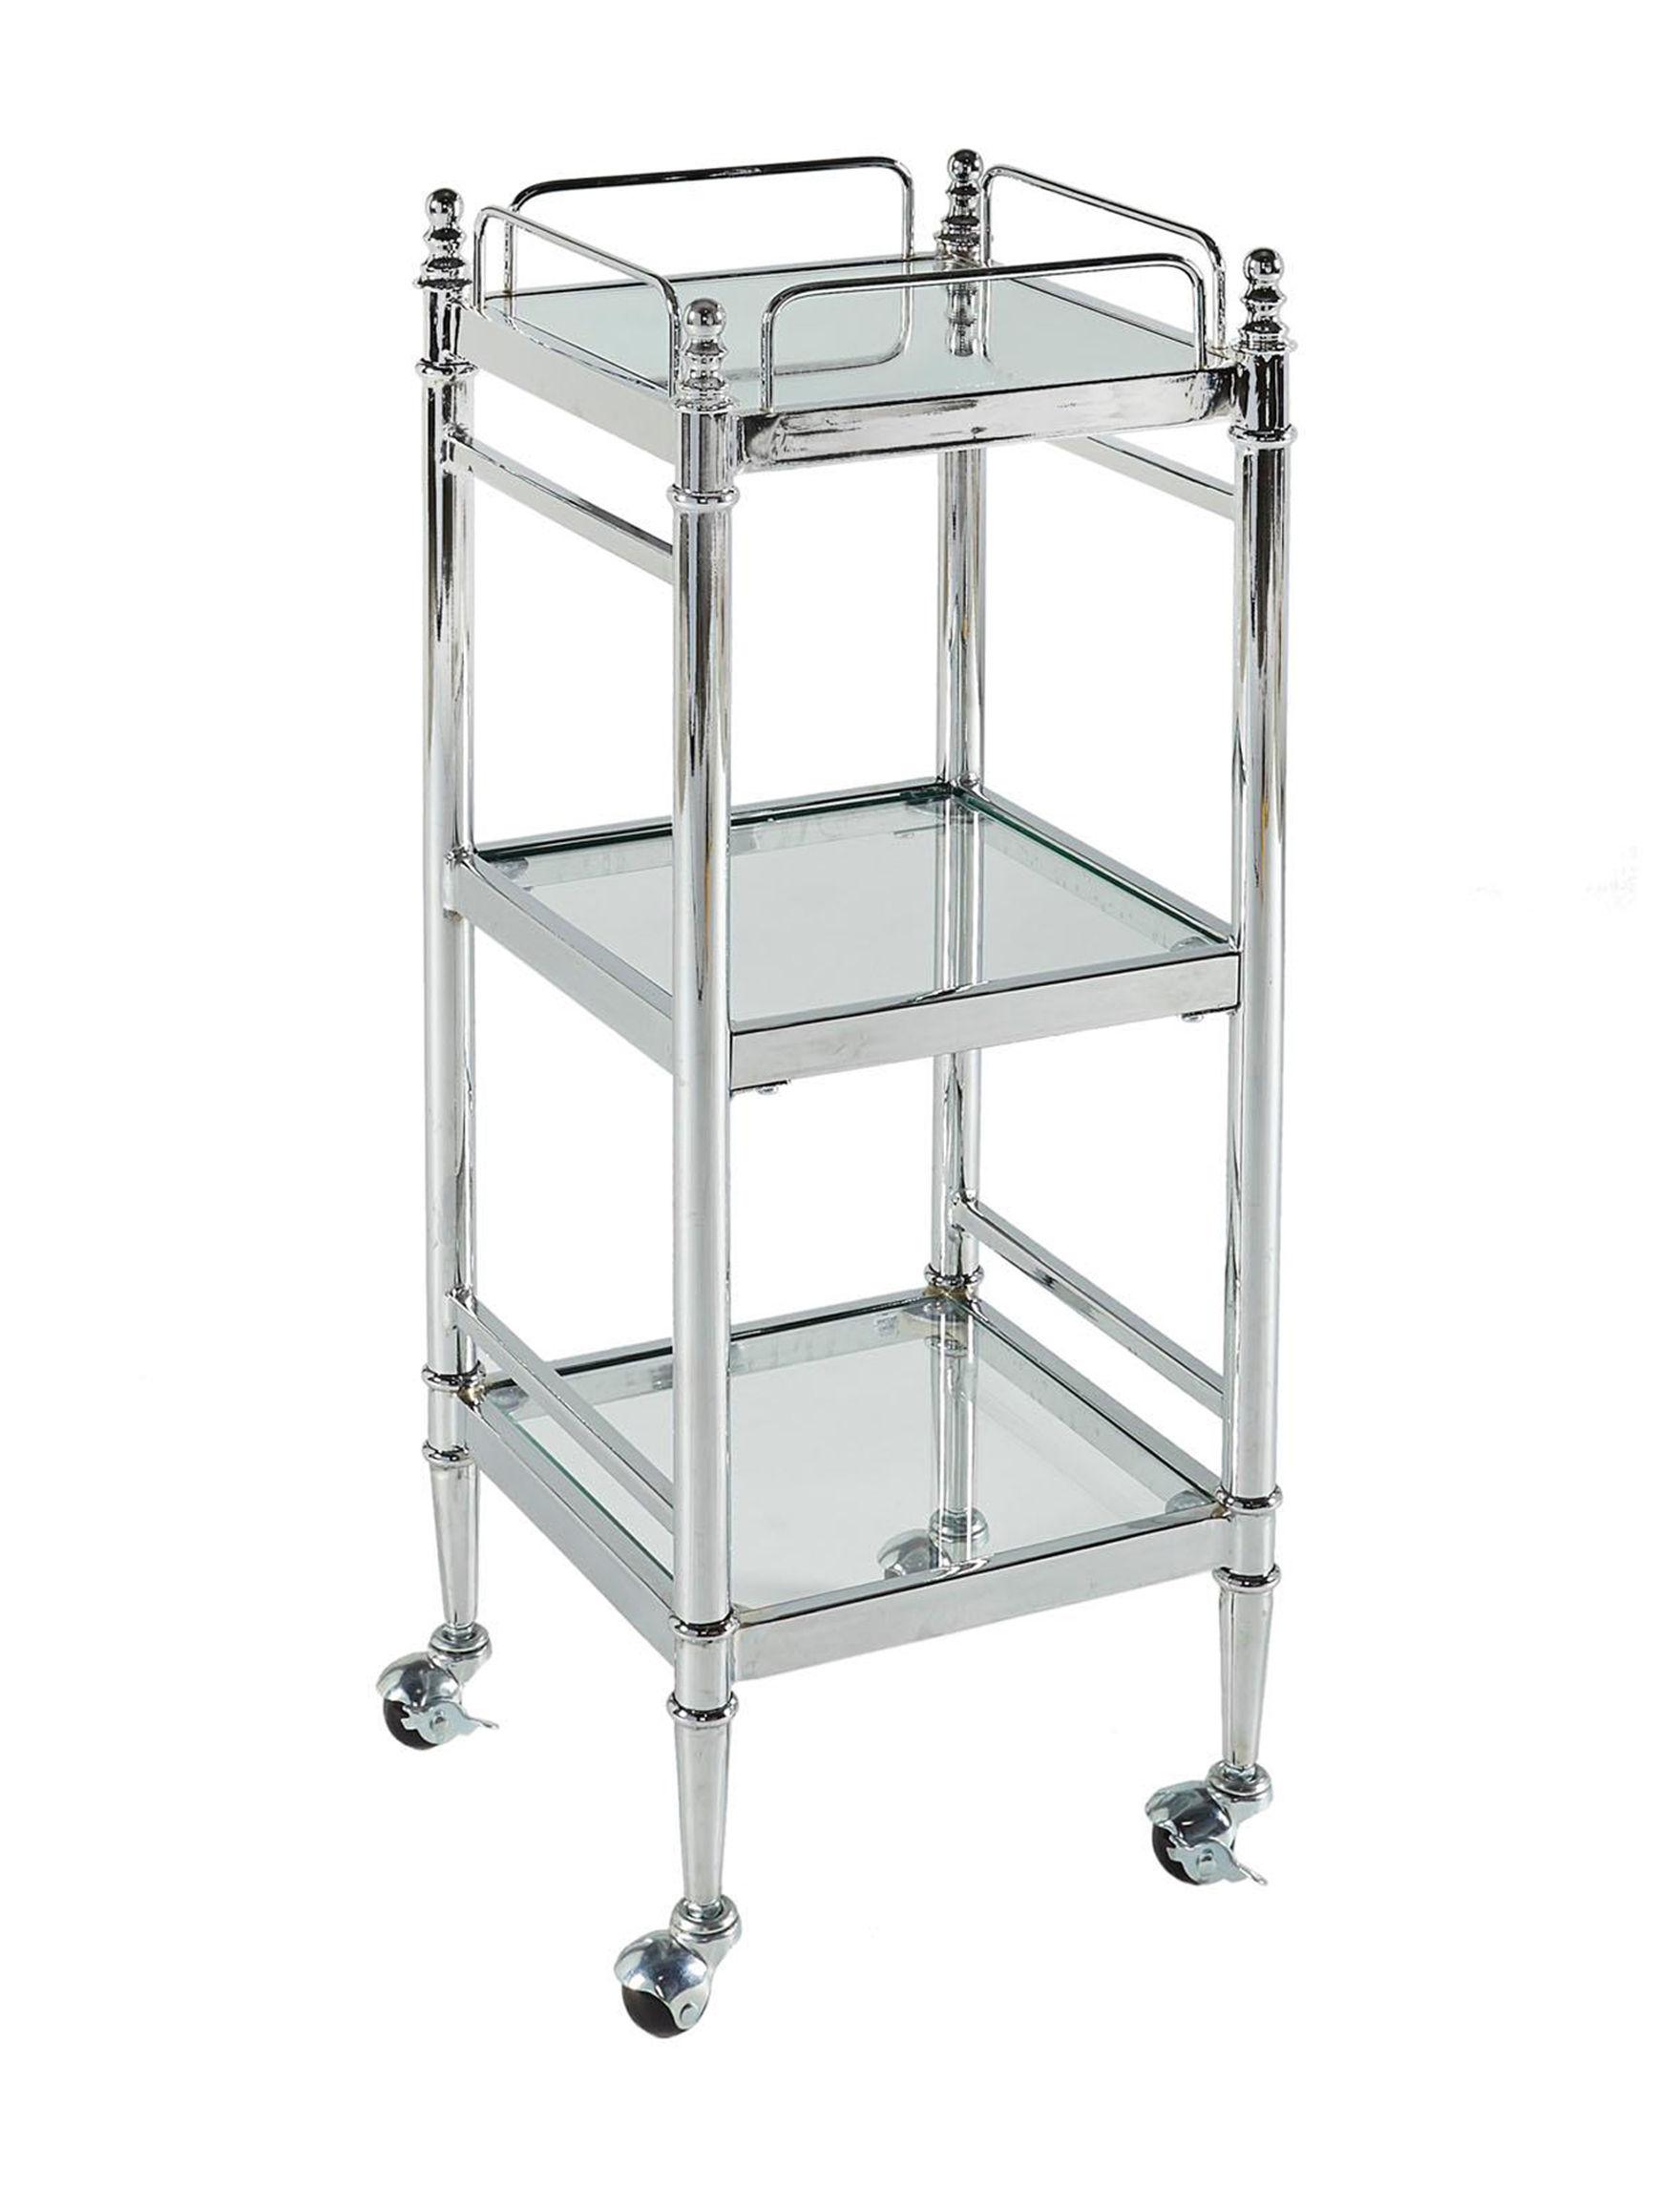 Linon Chrome Kitchen Islands & Carts Kitchen & Dining Furniture